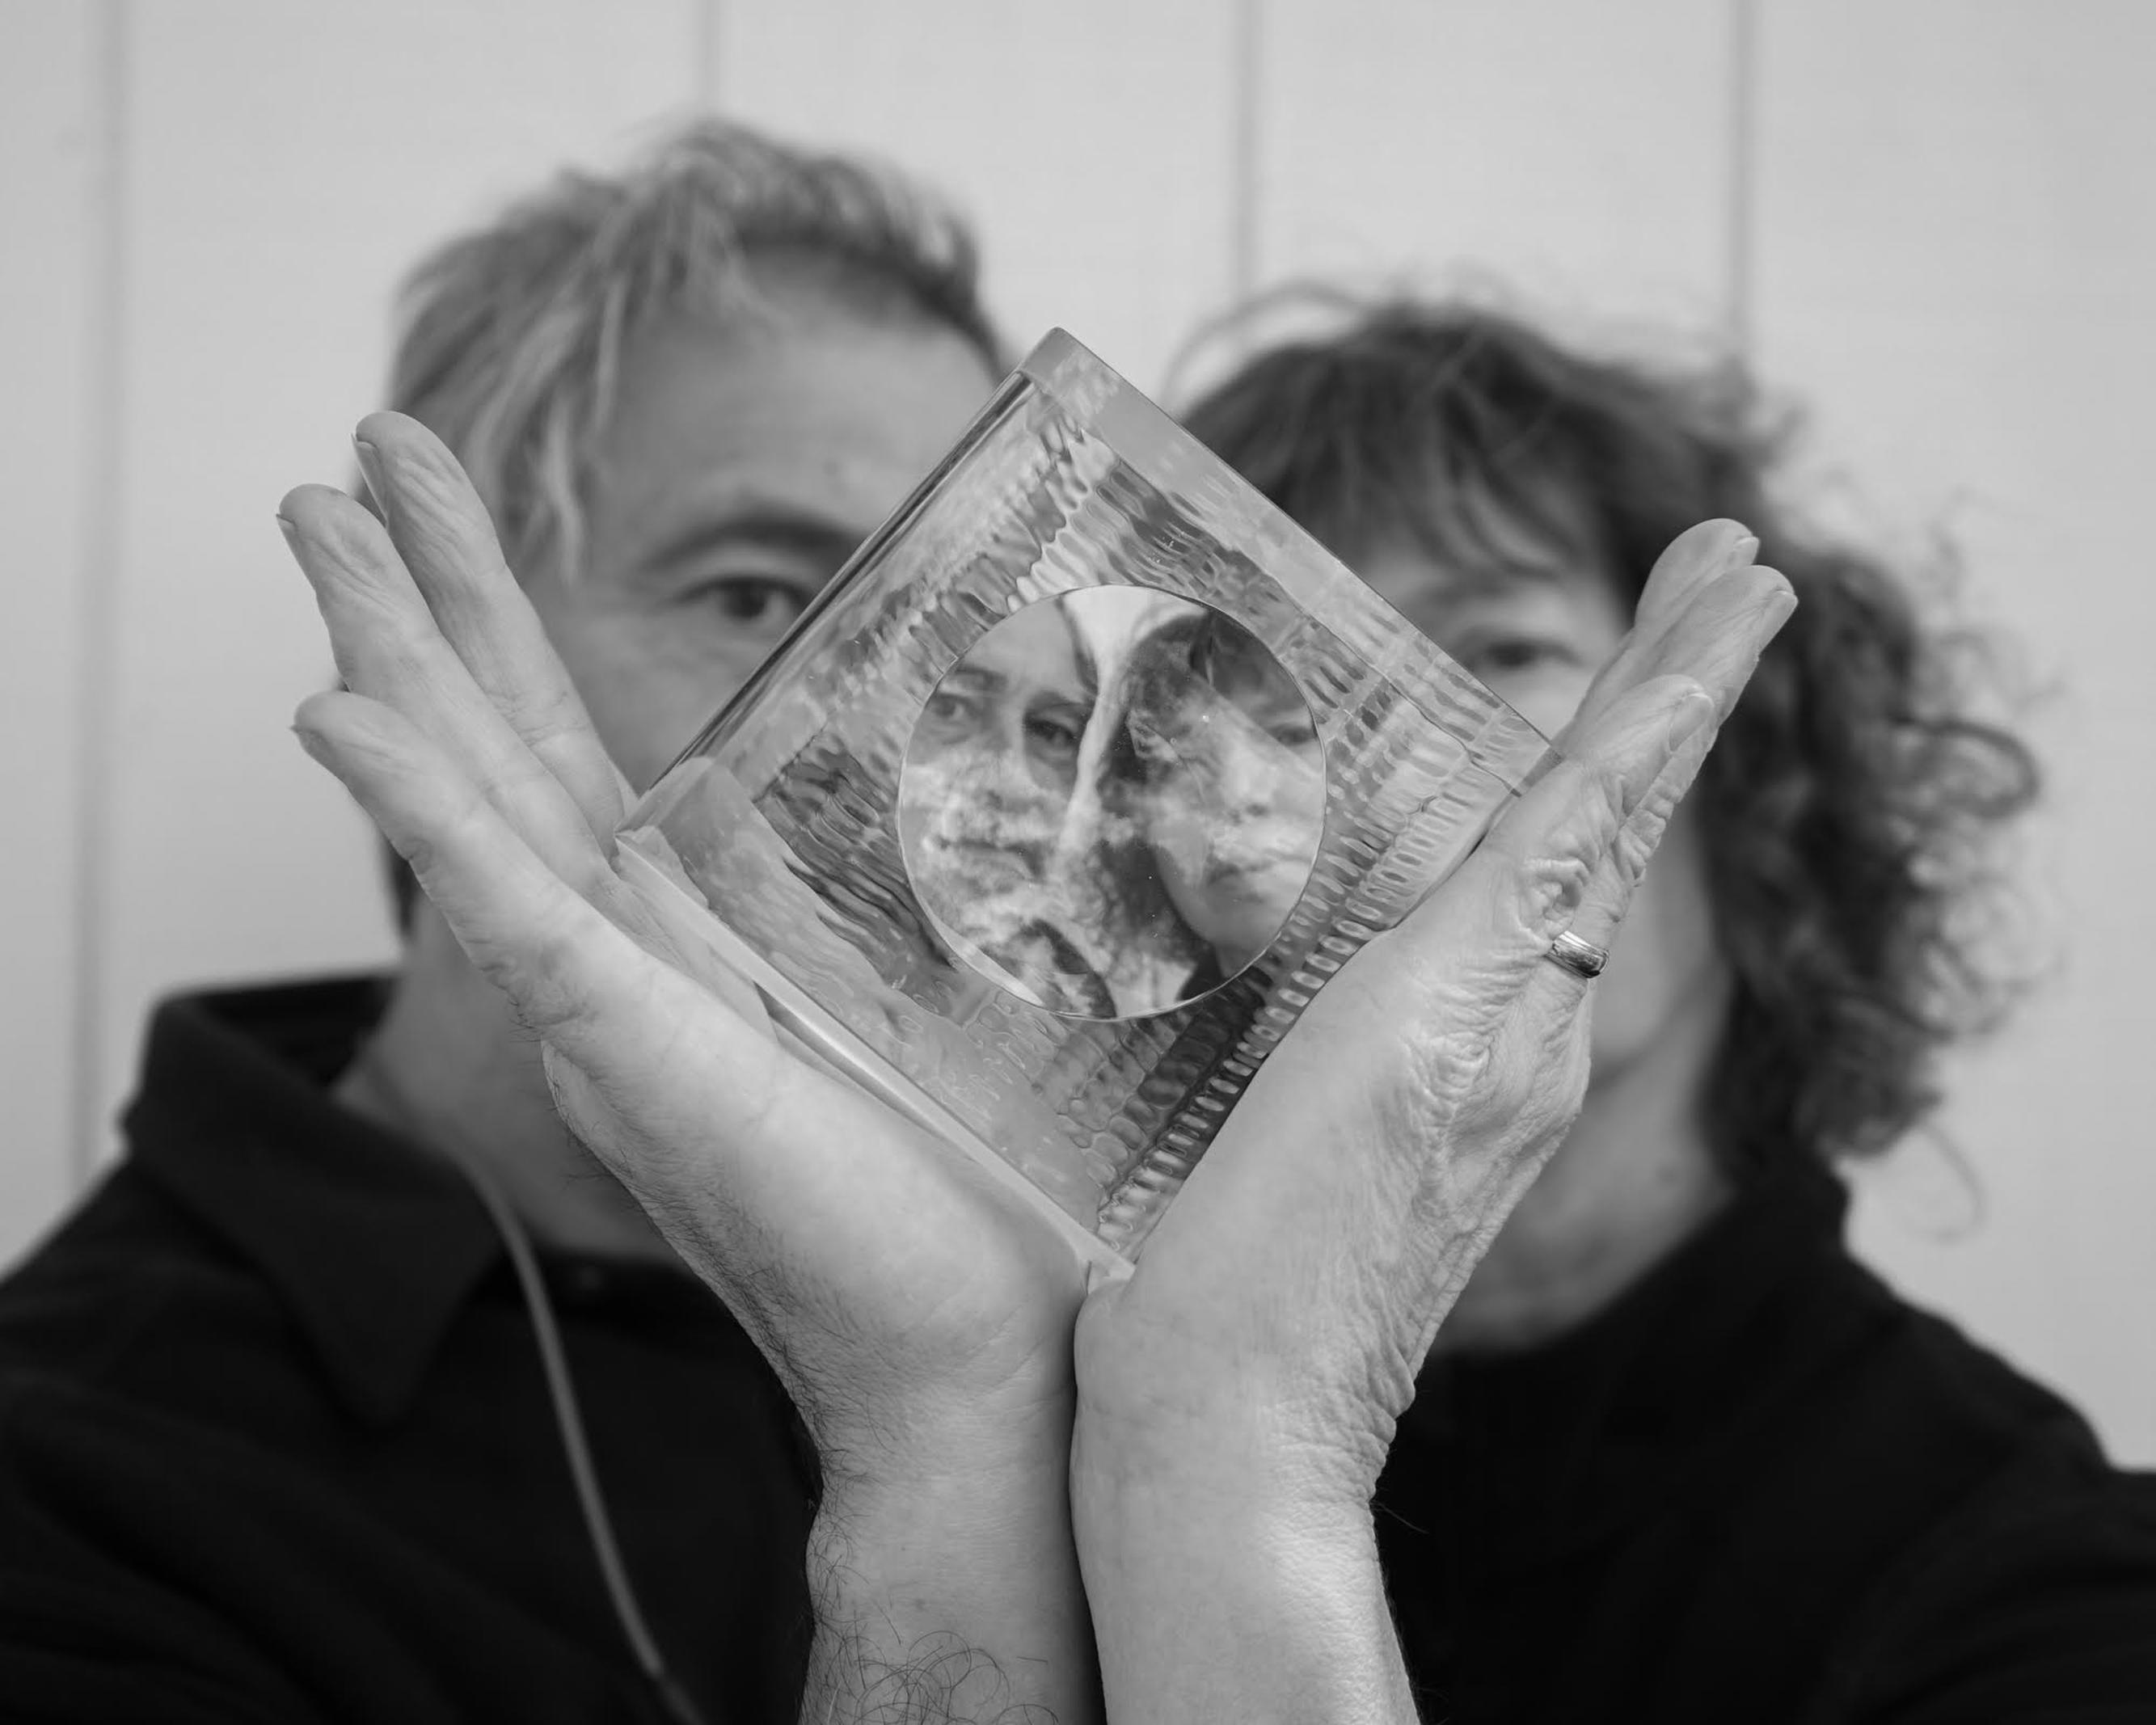 Kate Vogel and John Littleton seen through a glass cube.